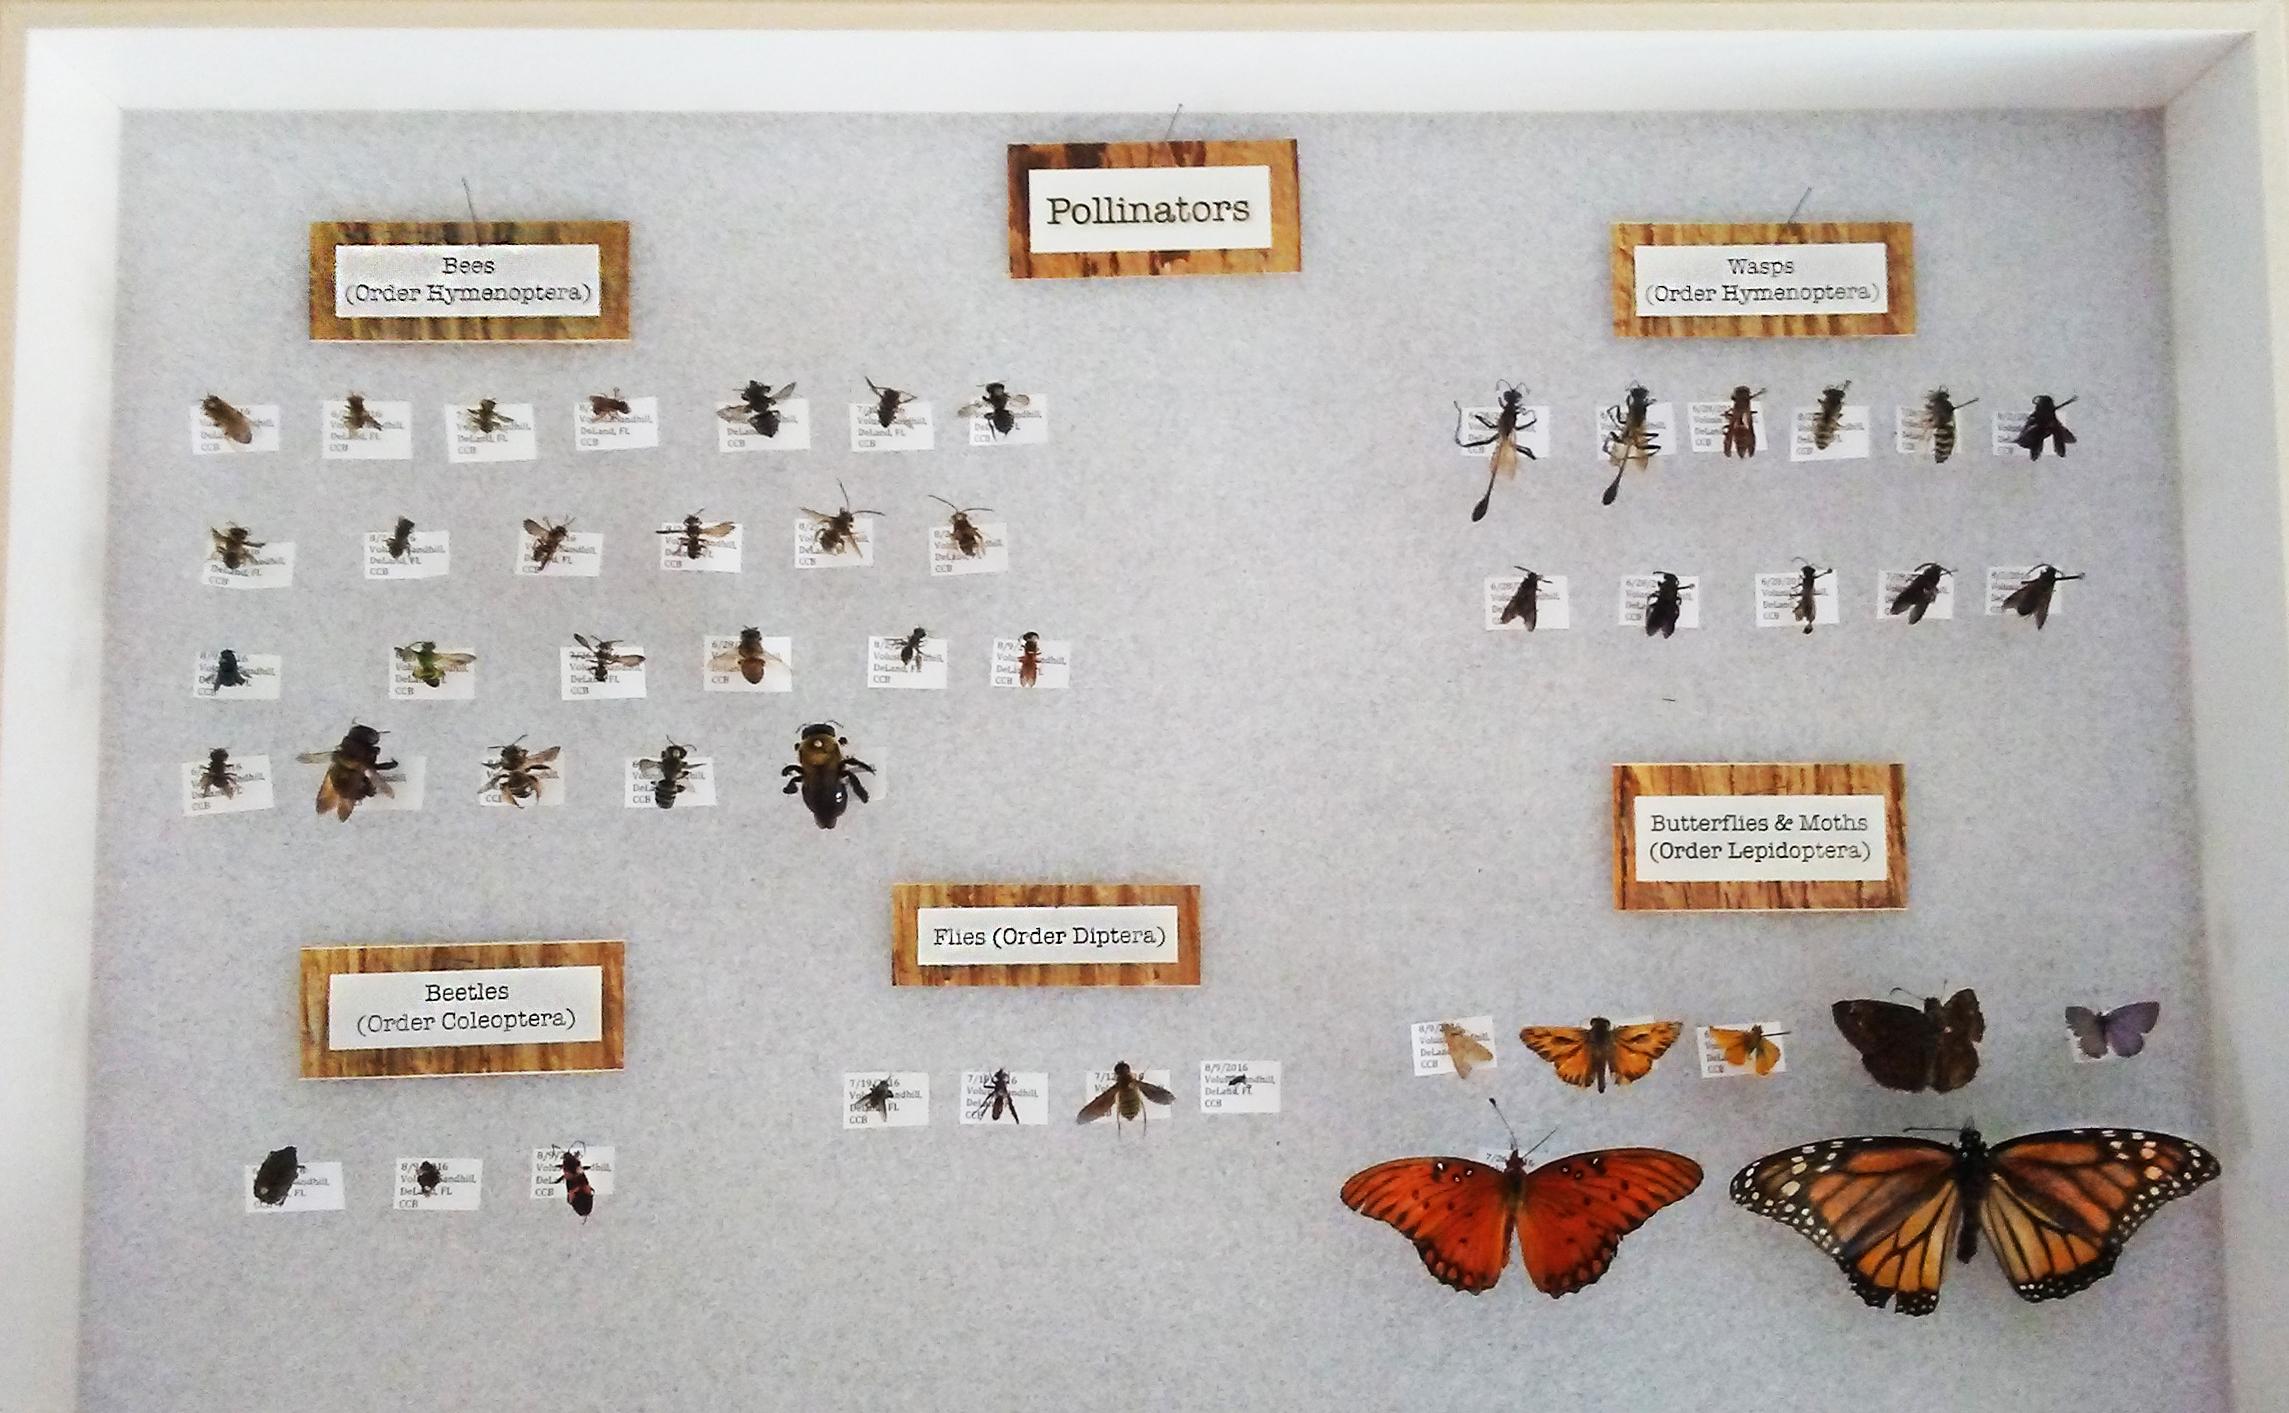 media/pollinator-collection.jpg